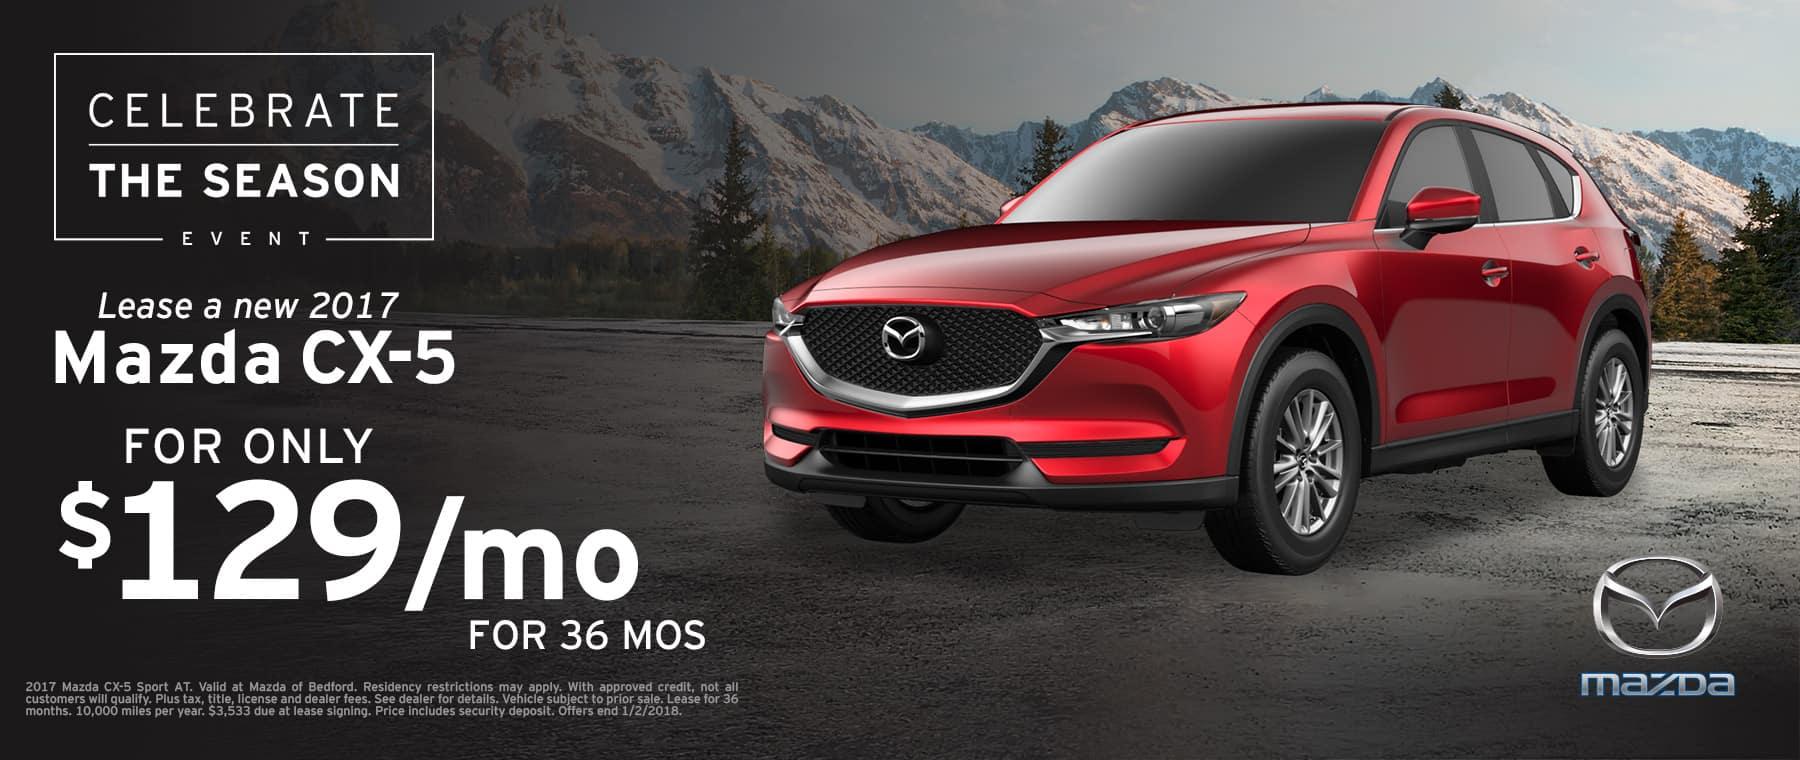 2017 Mazda CX-5 Lease Offer